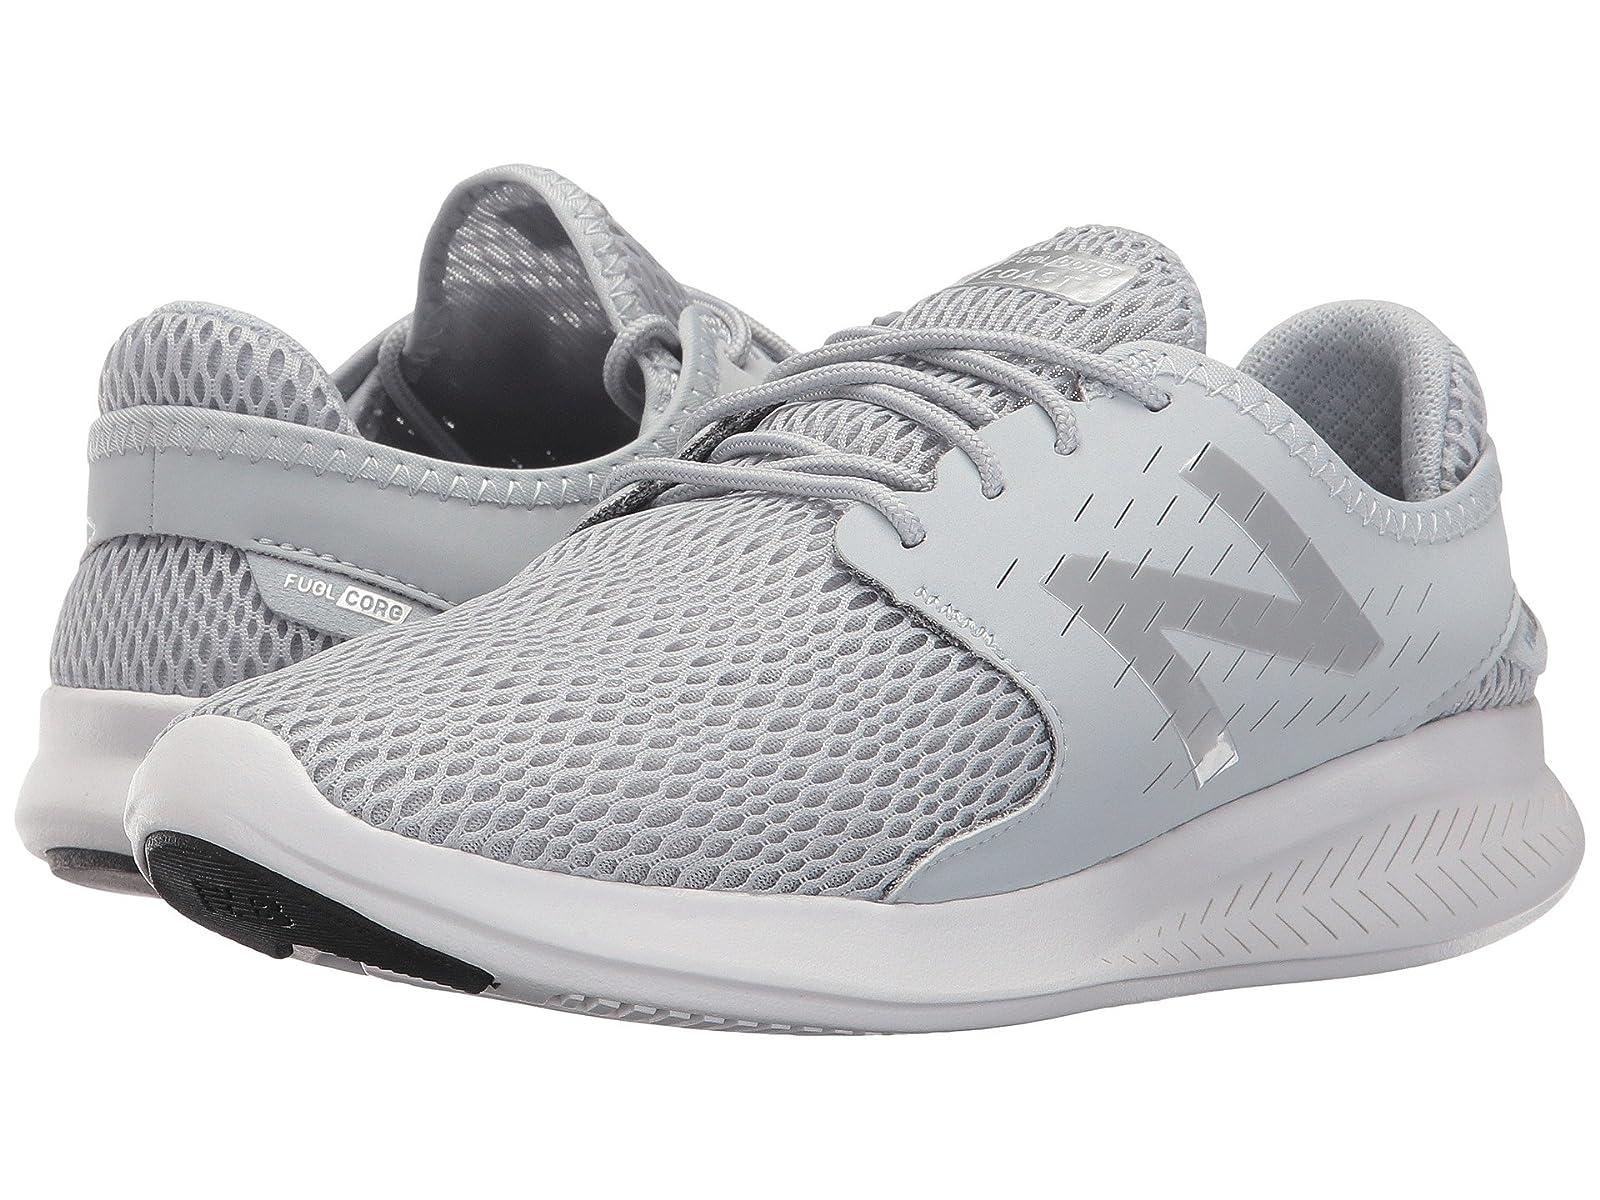 New Balance Coast v3Cheap and distinctive eye-catching shoes